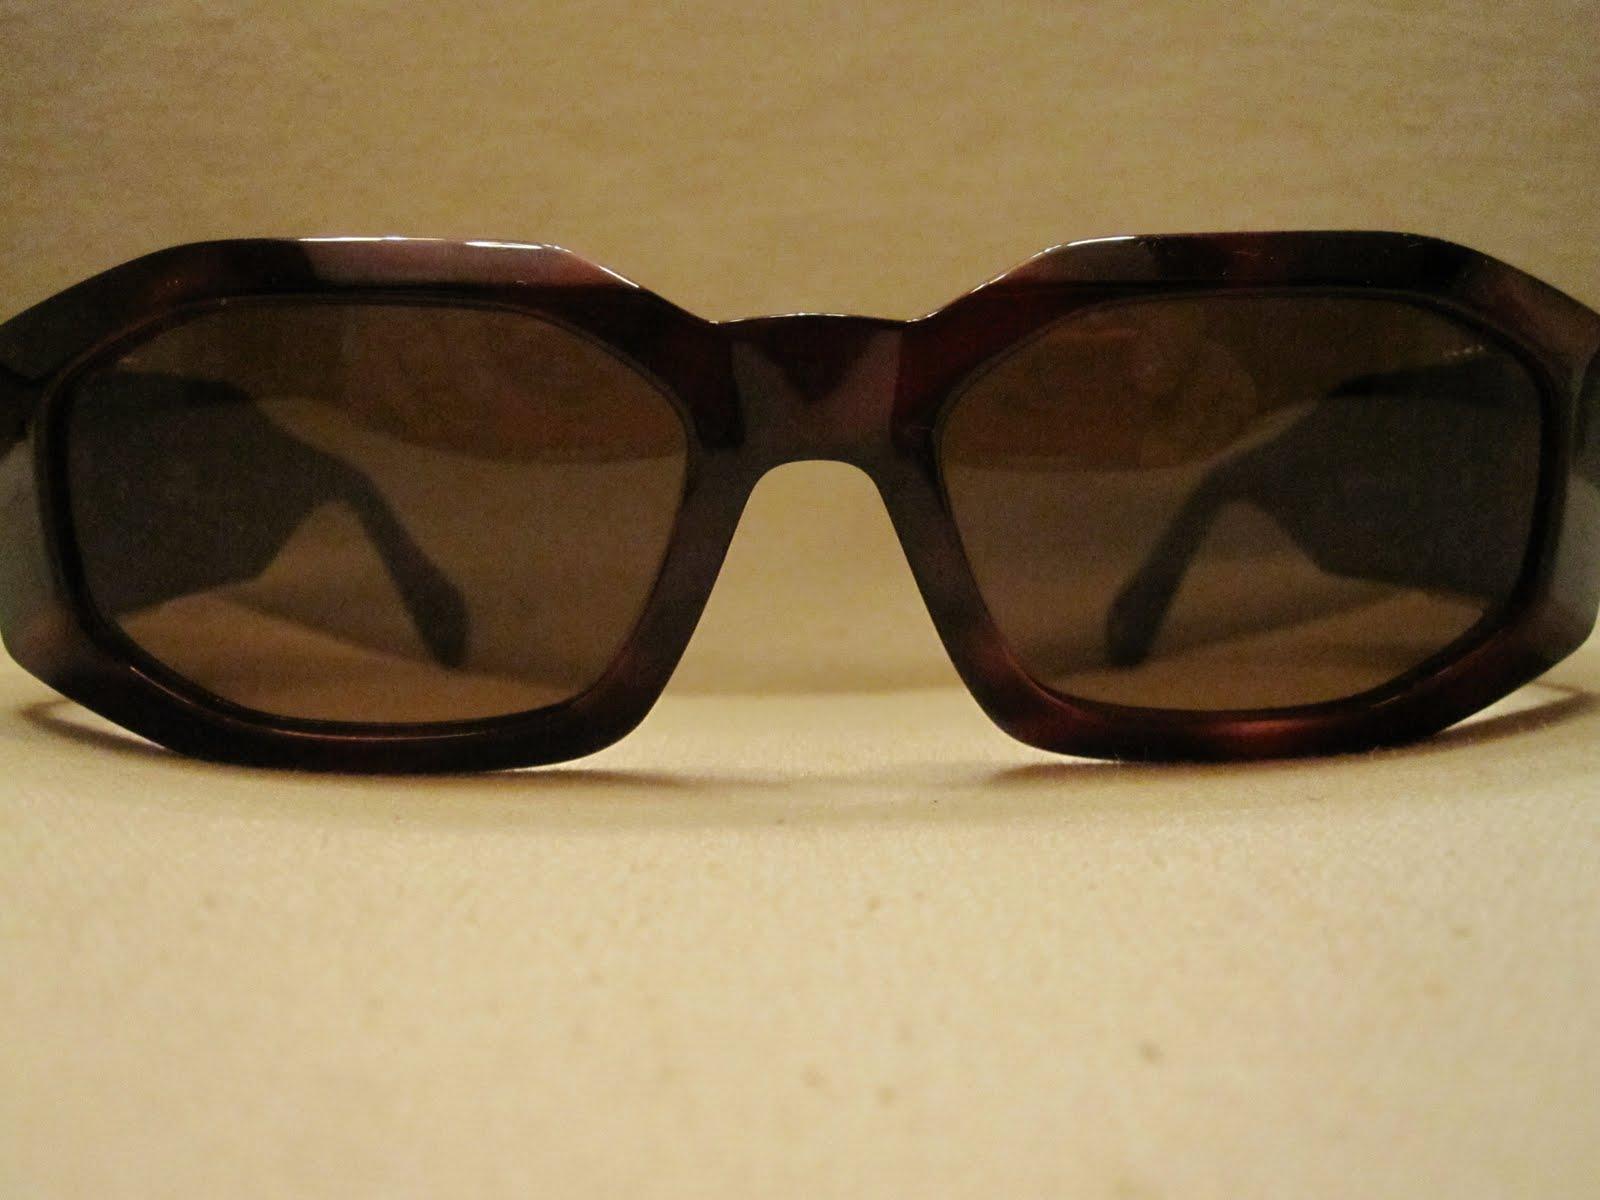 ce788840d1b6 GIANNI VERSACE VINTAGE Medusa Sunglasses as NOTORIOUS BIG Mod 414/H Col 900  Swarowsky